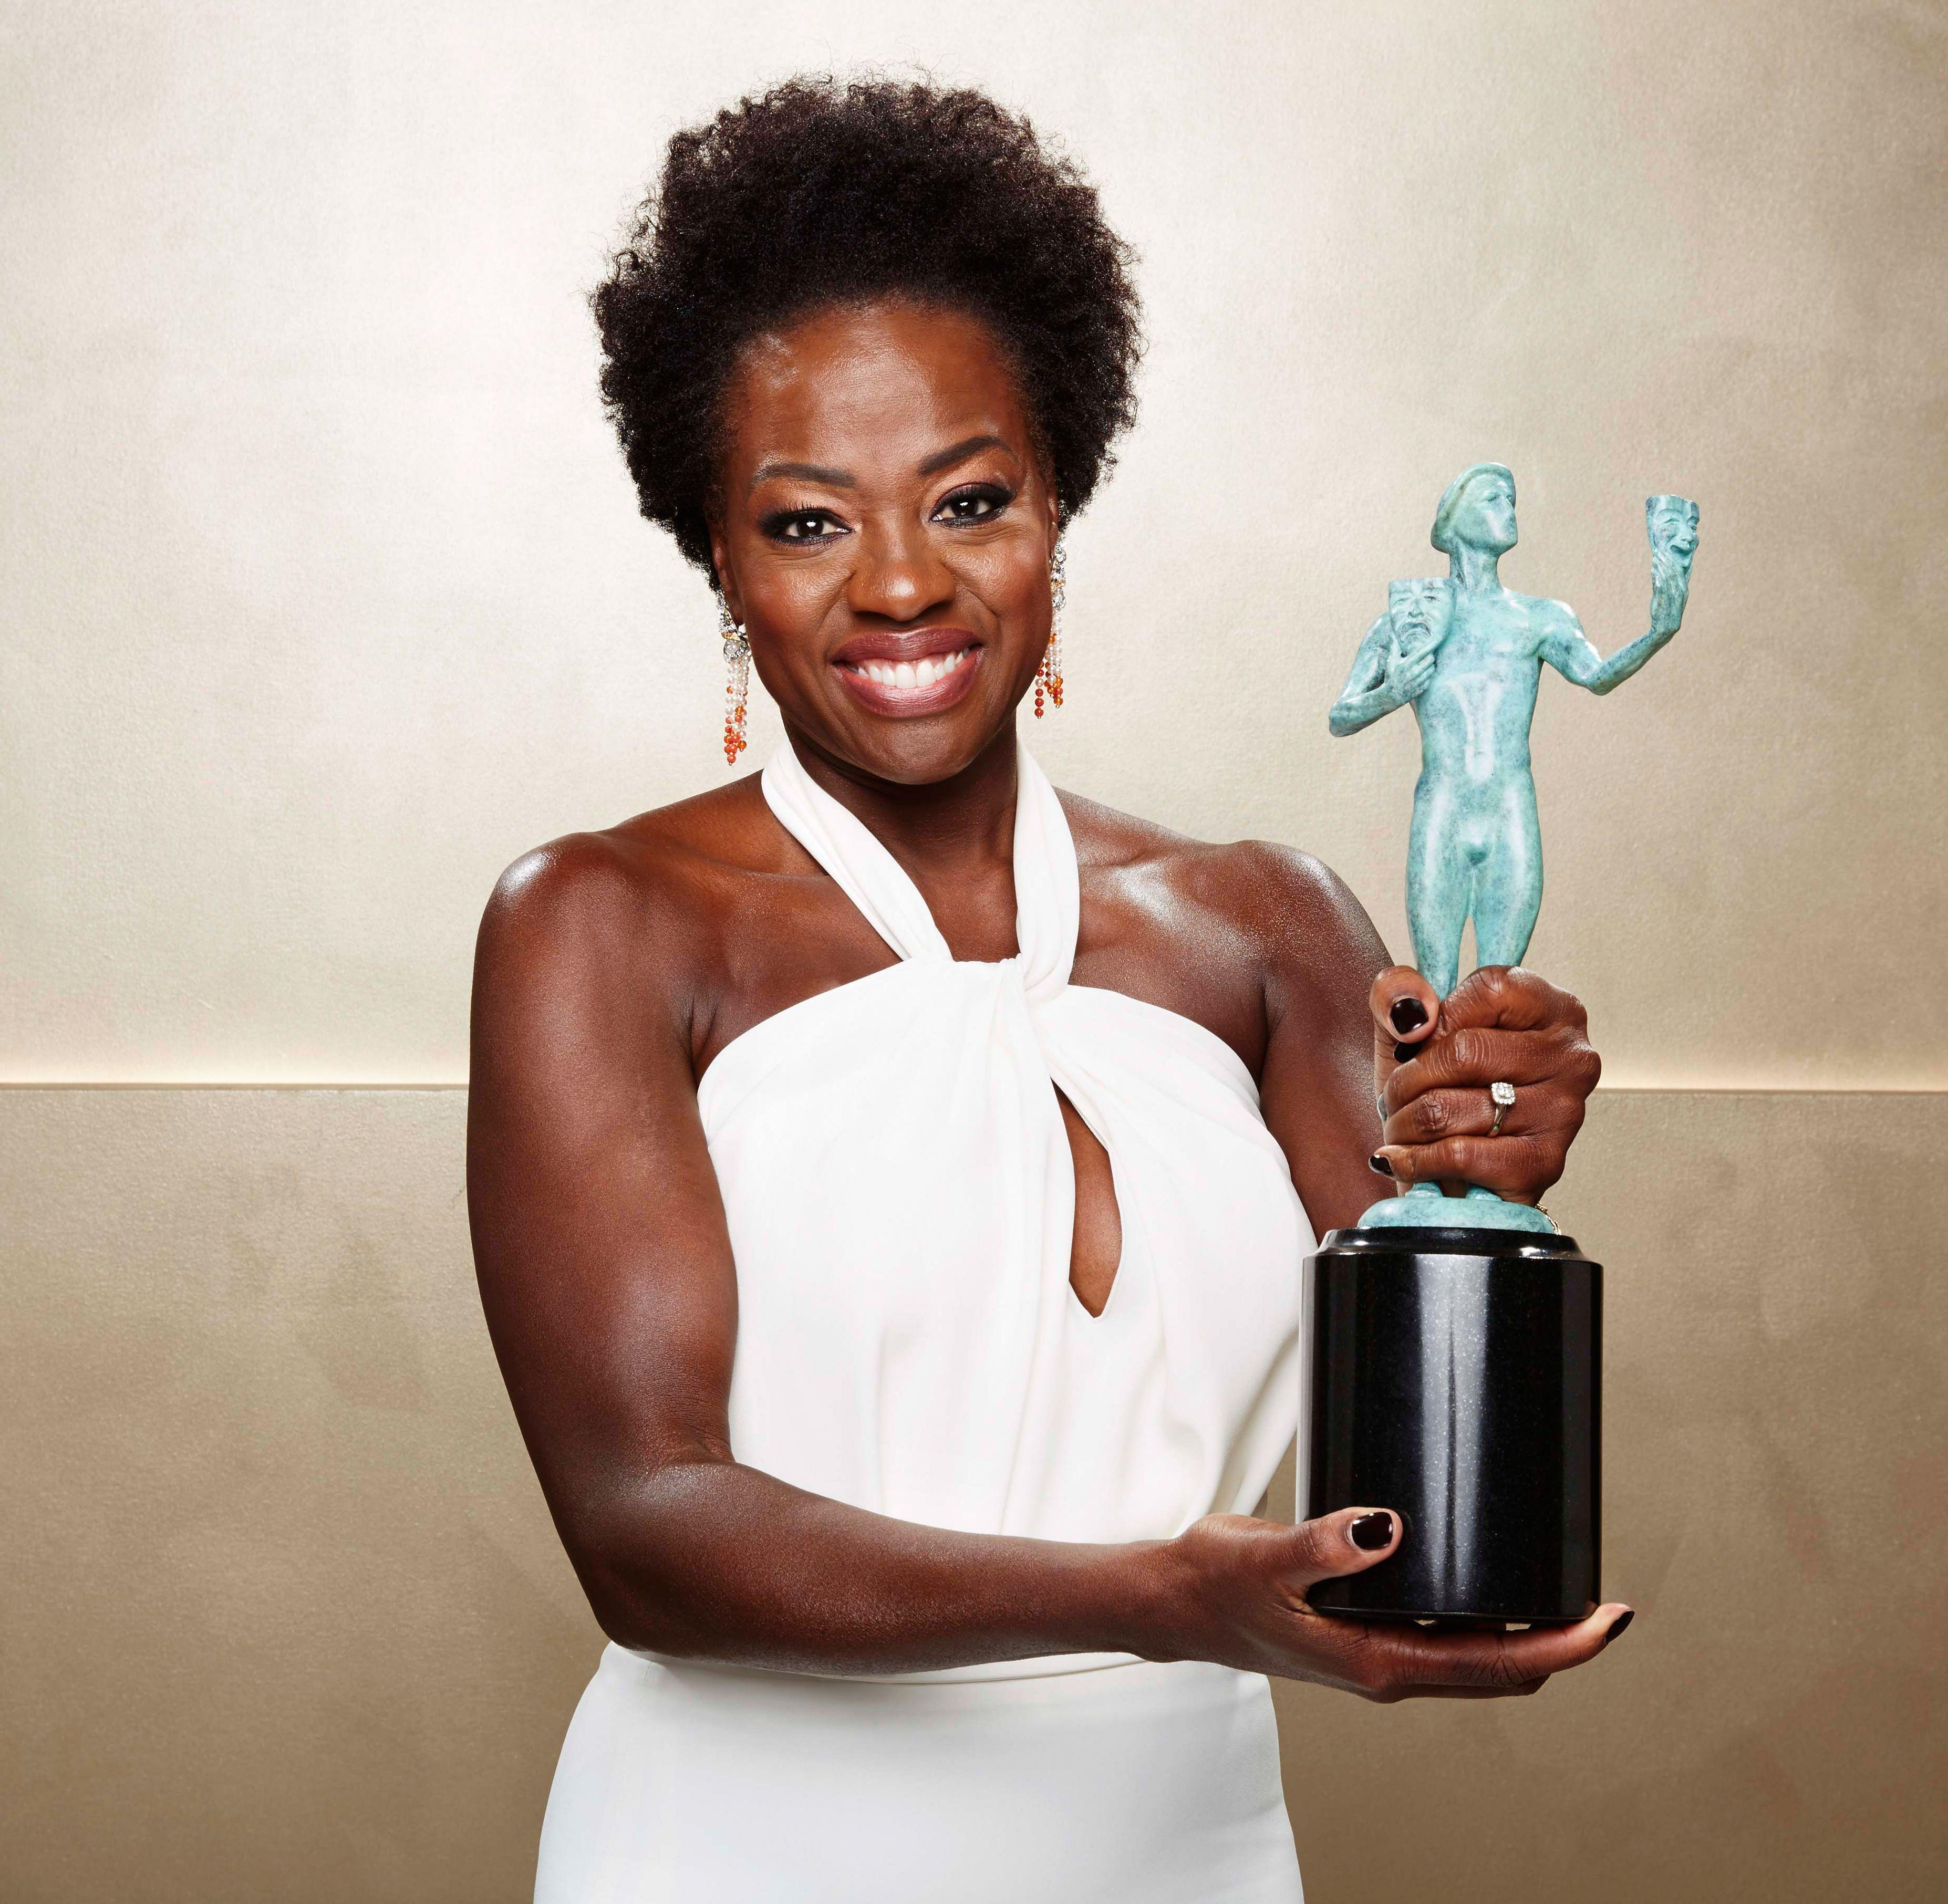 Viola Davis and her SAG Award fo leading actress in a Drama